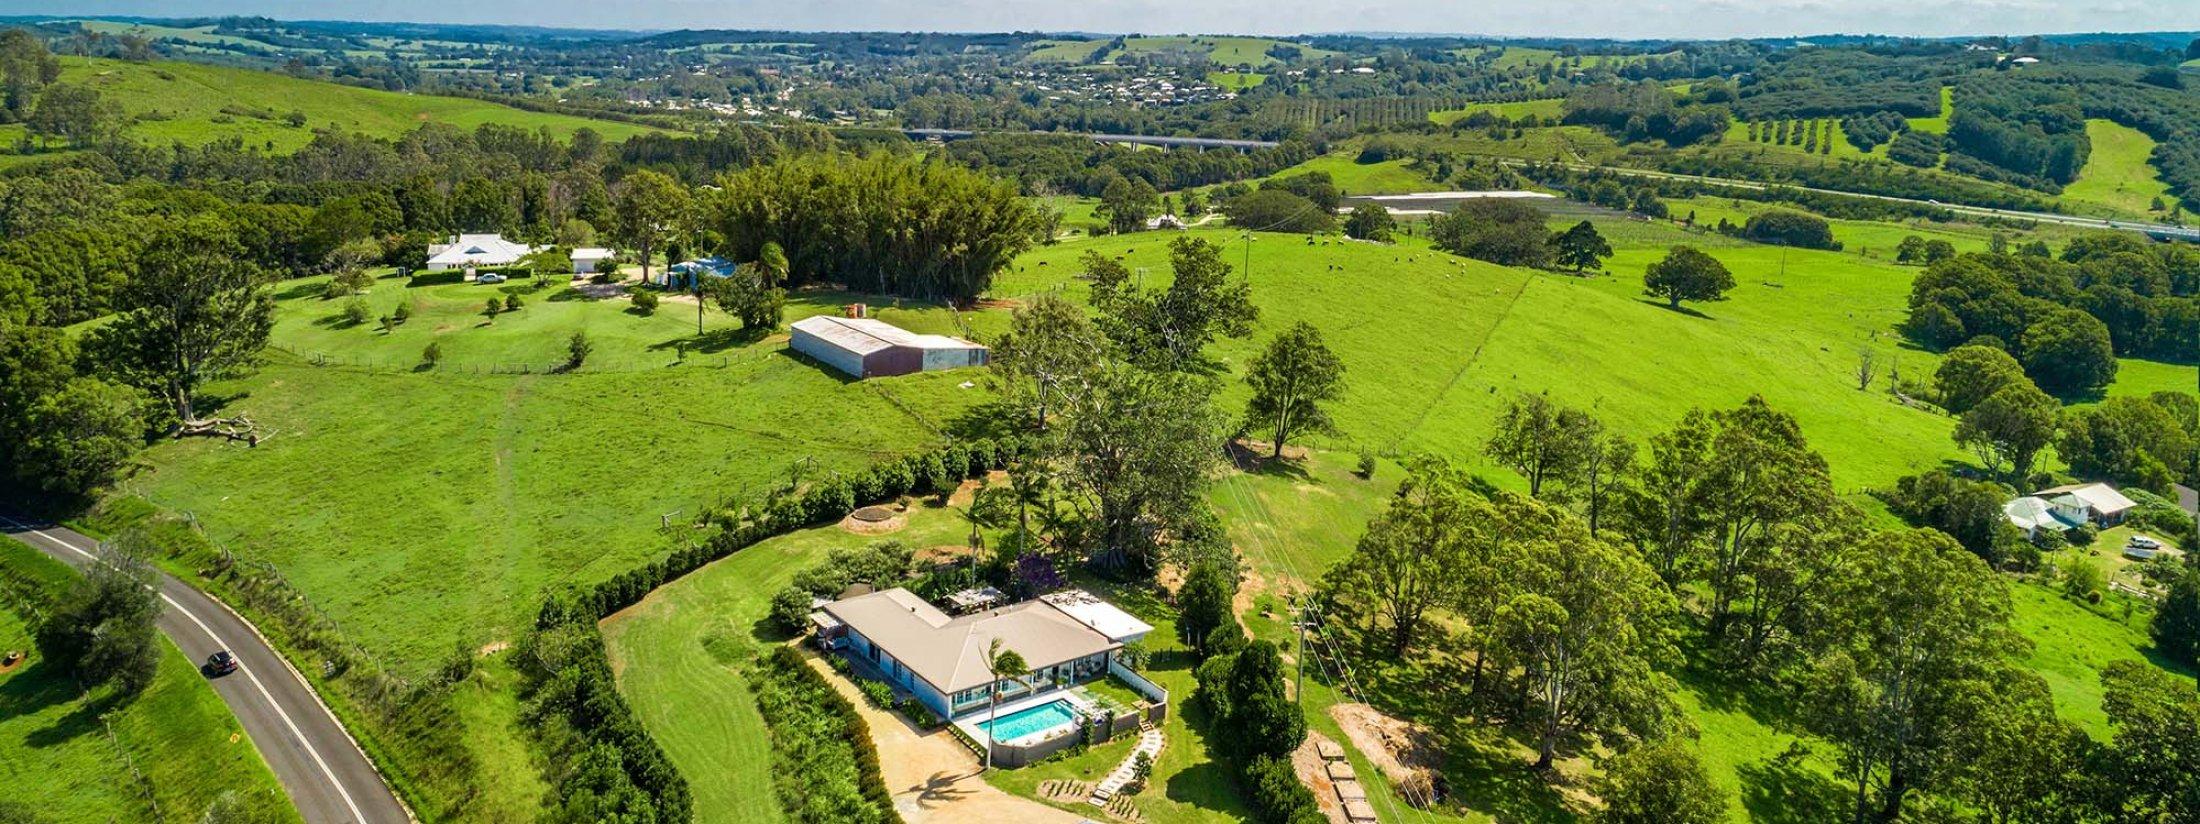 Byron Hills Hinterland Retreat - Byron Bay - Aerial View b